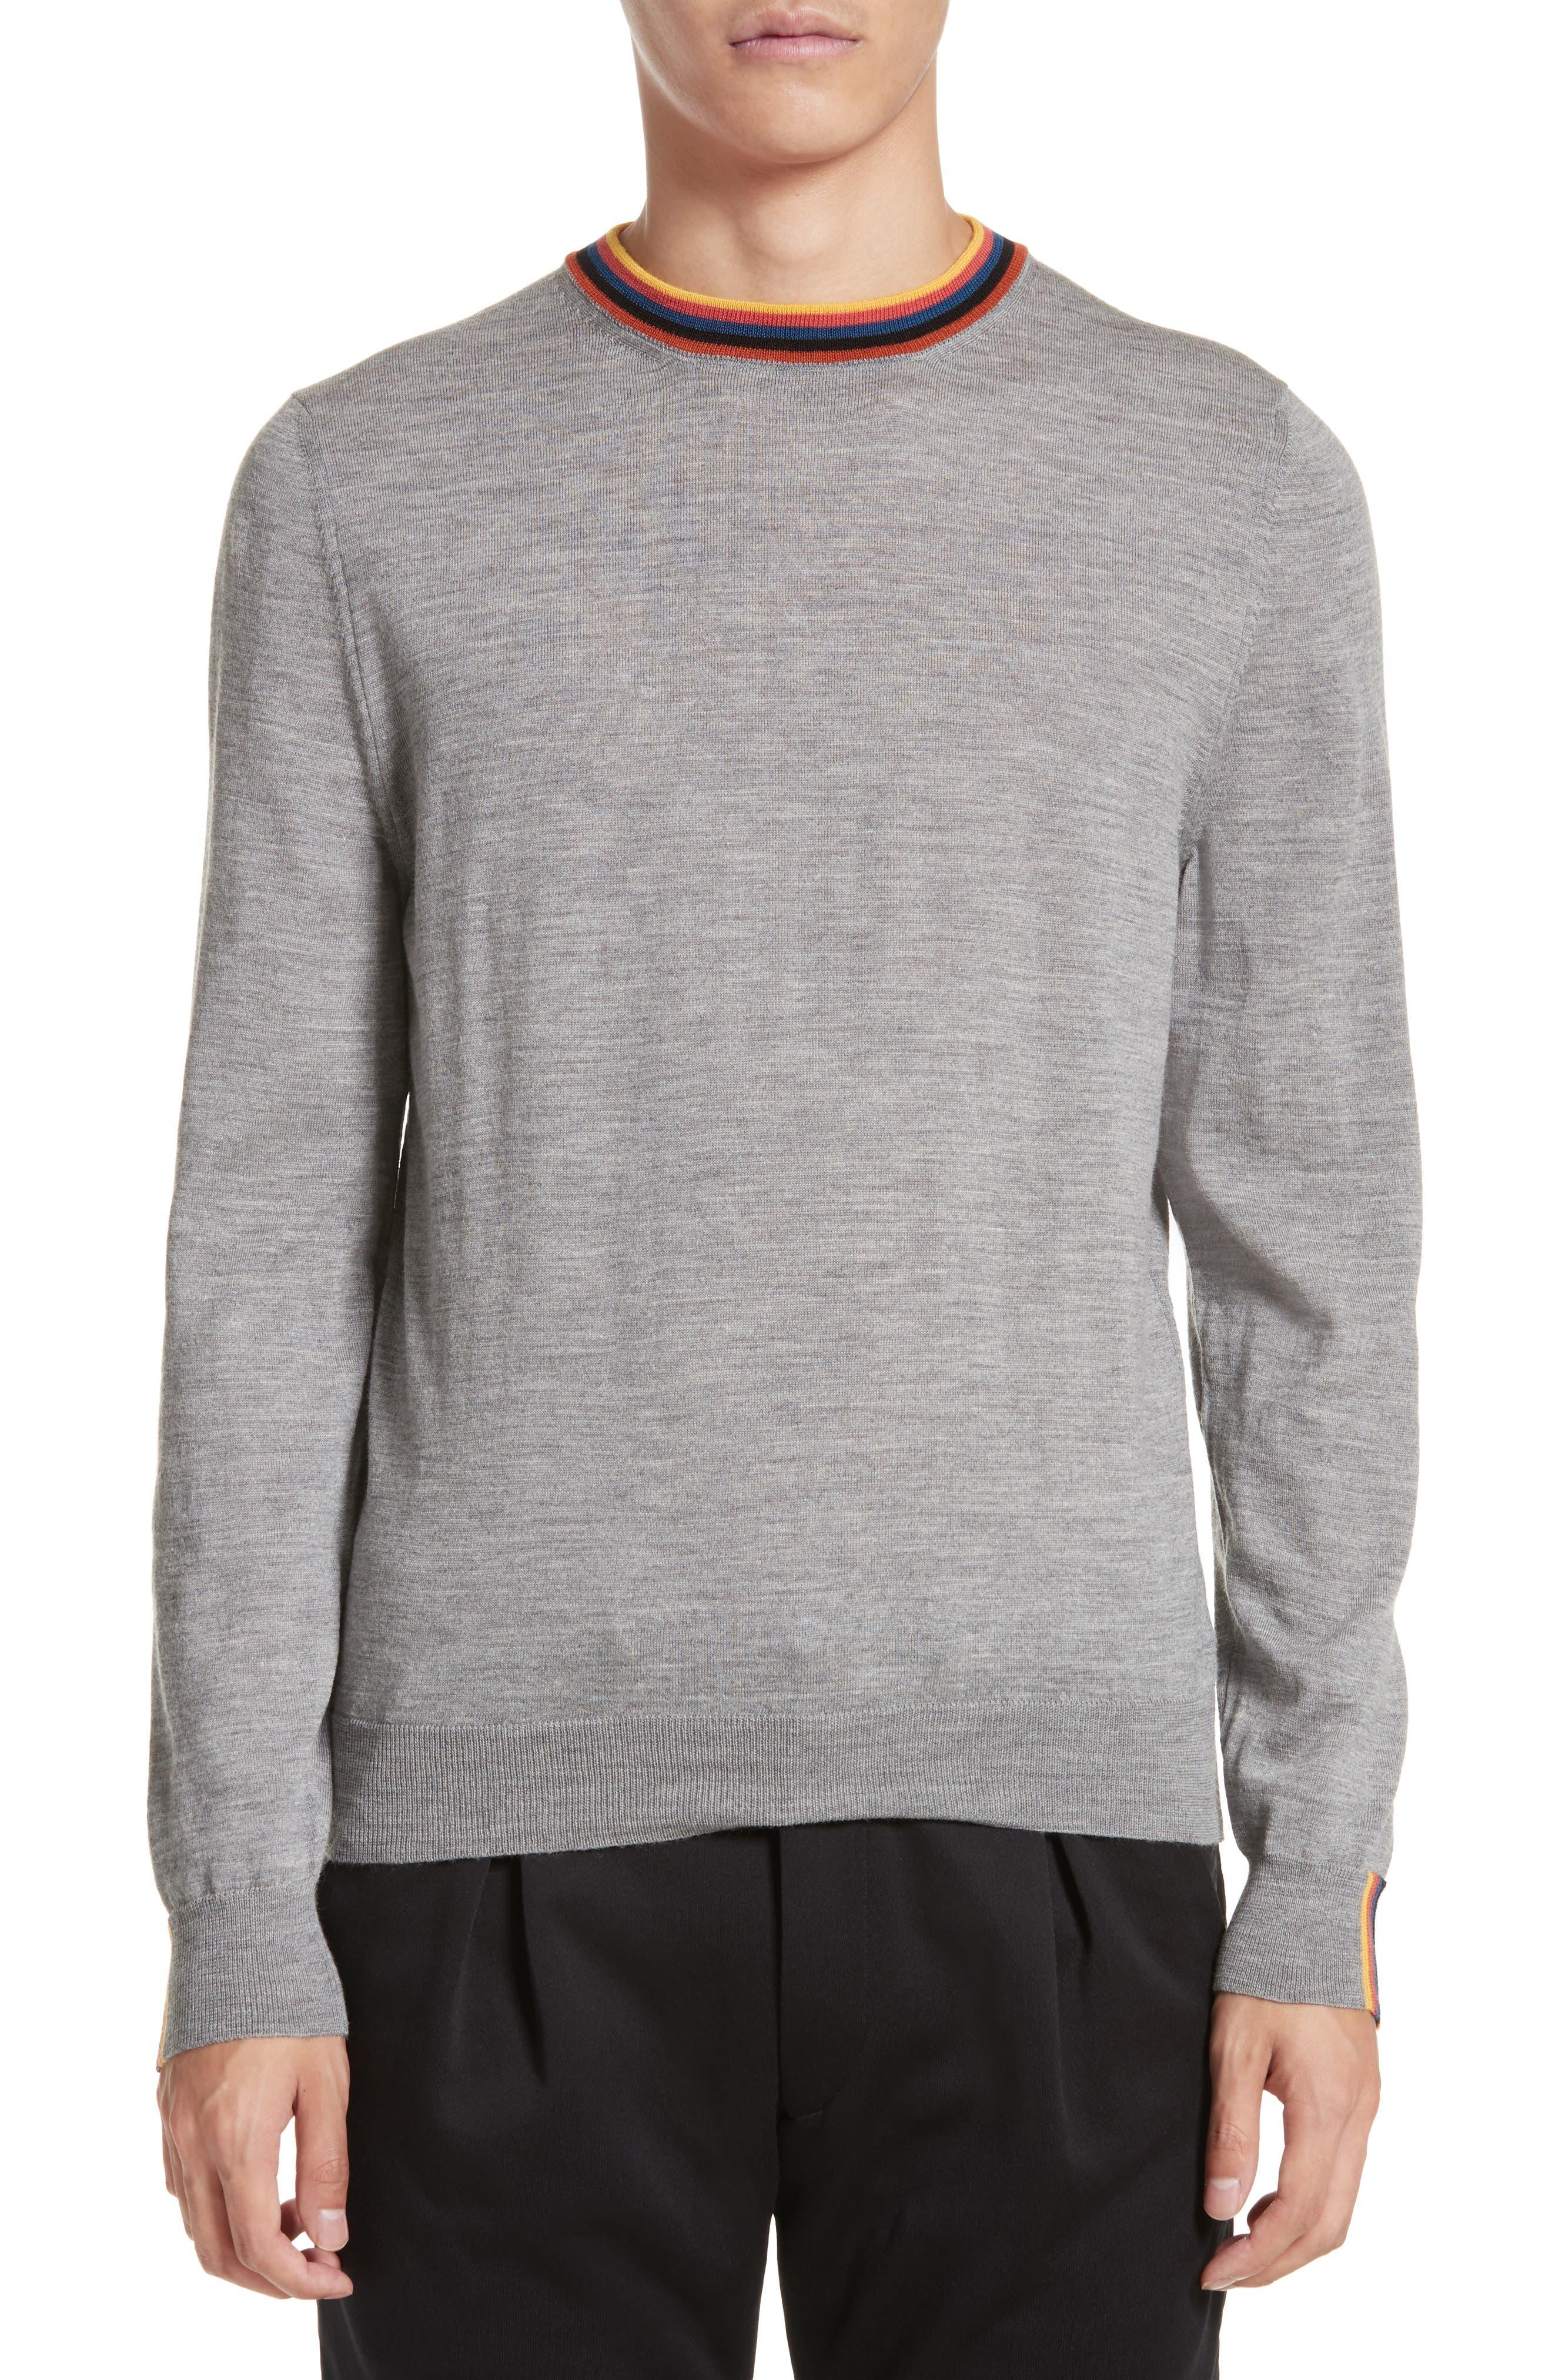 Main Image - Paul Smith Artist Stripe Merino Wool Sweater